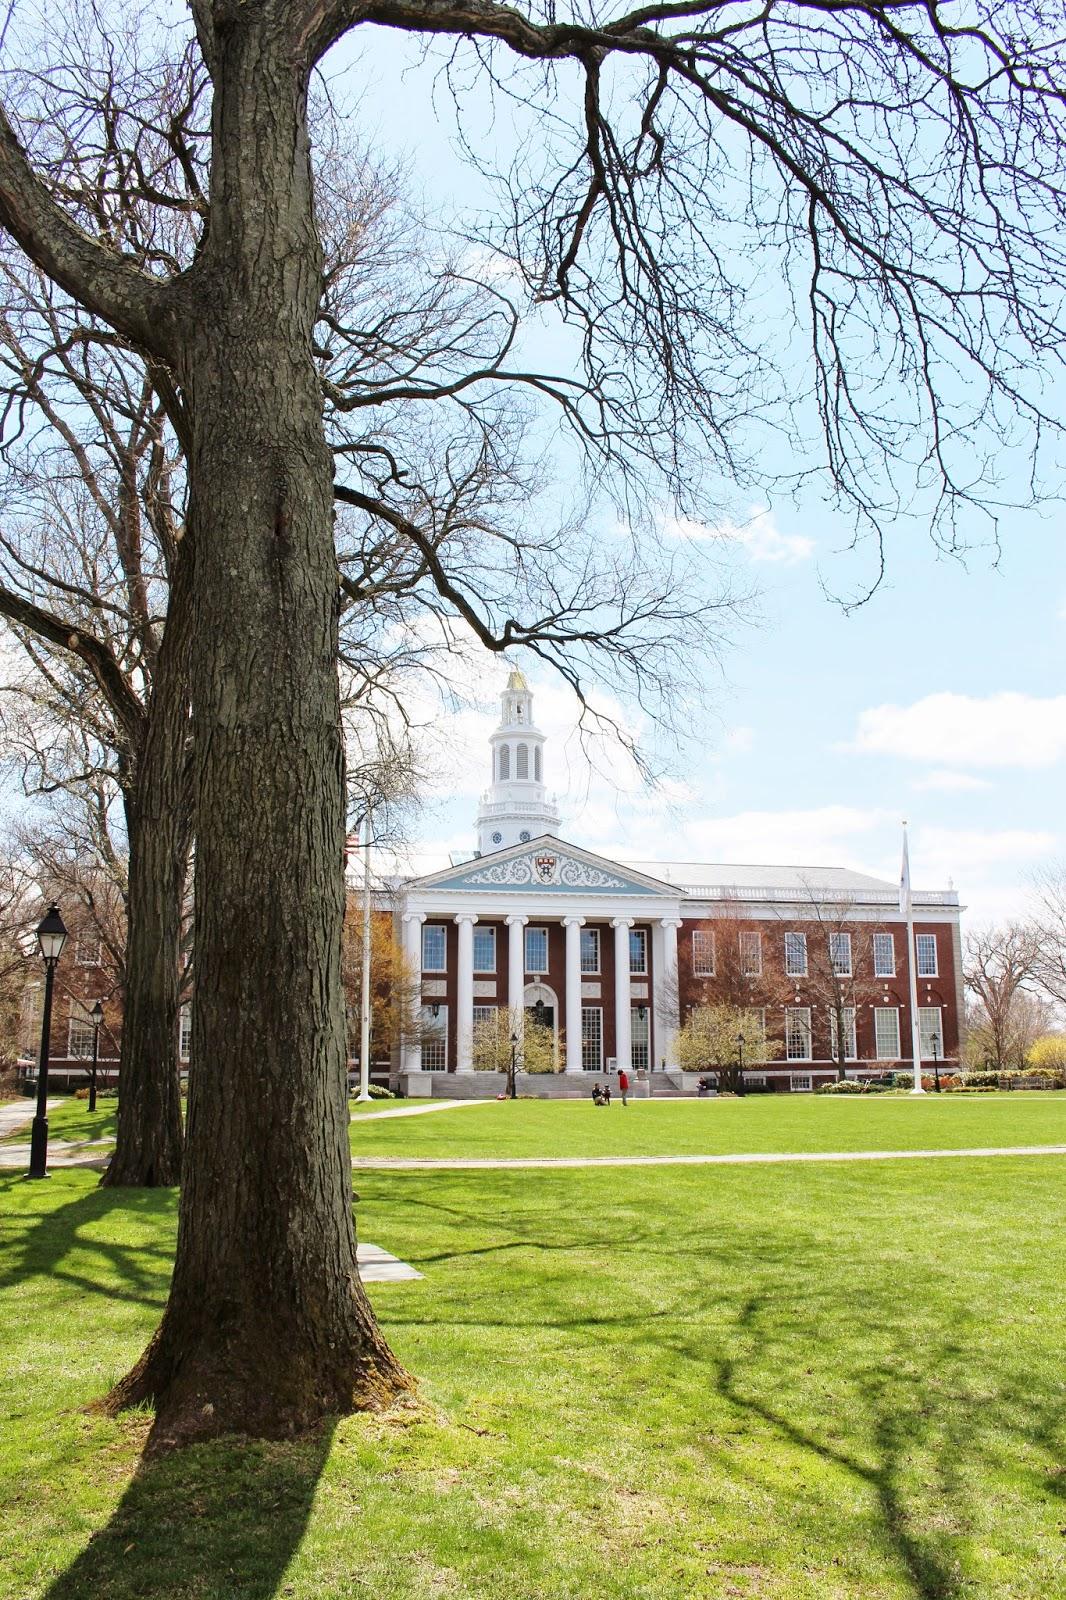 bijuleni - Harvard School of Business Library